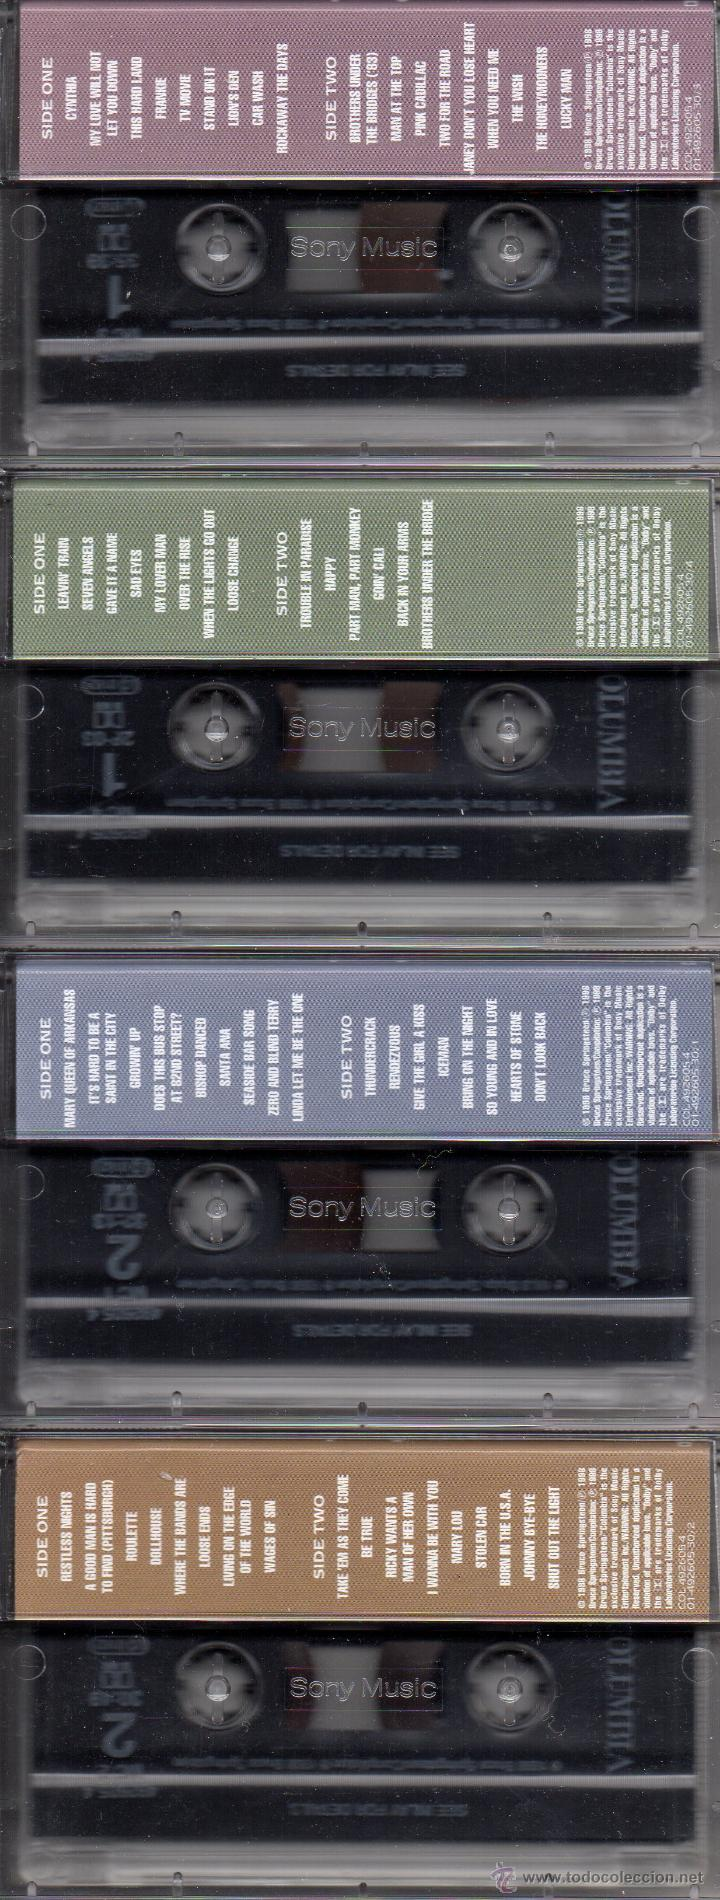 Casetes antiguos: BRUCE SPRINGSTEEN TRACKS DELUXE 4-CASSETTE BOX SET. EN MUY BUEN ESTADO. - Foto 3 - 44834652